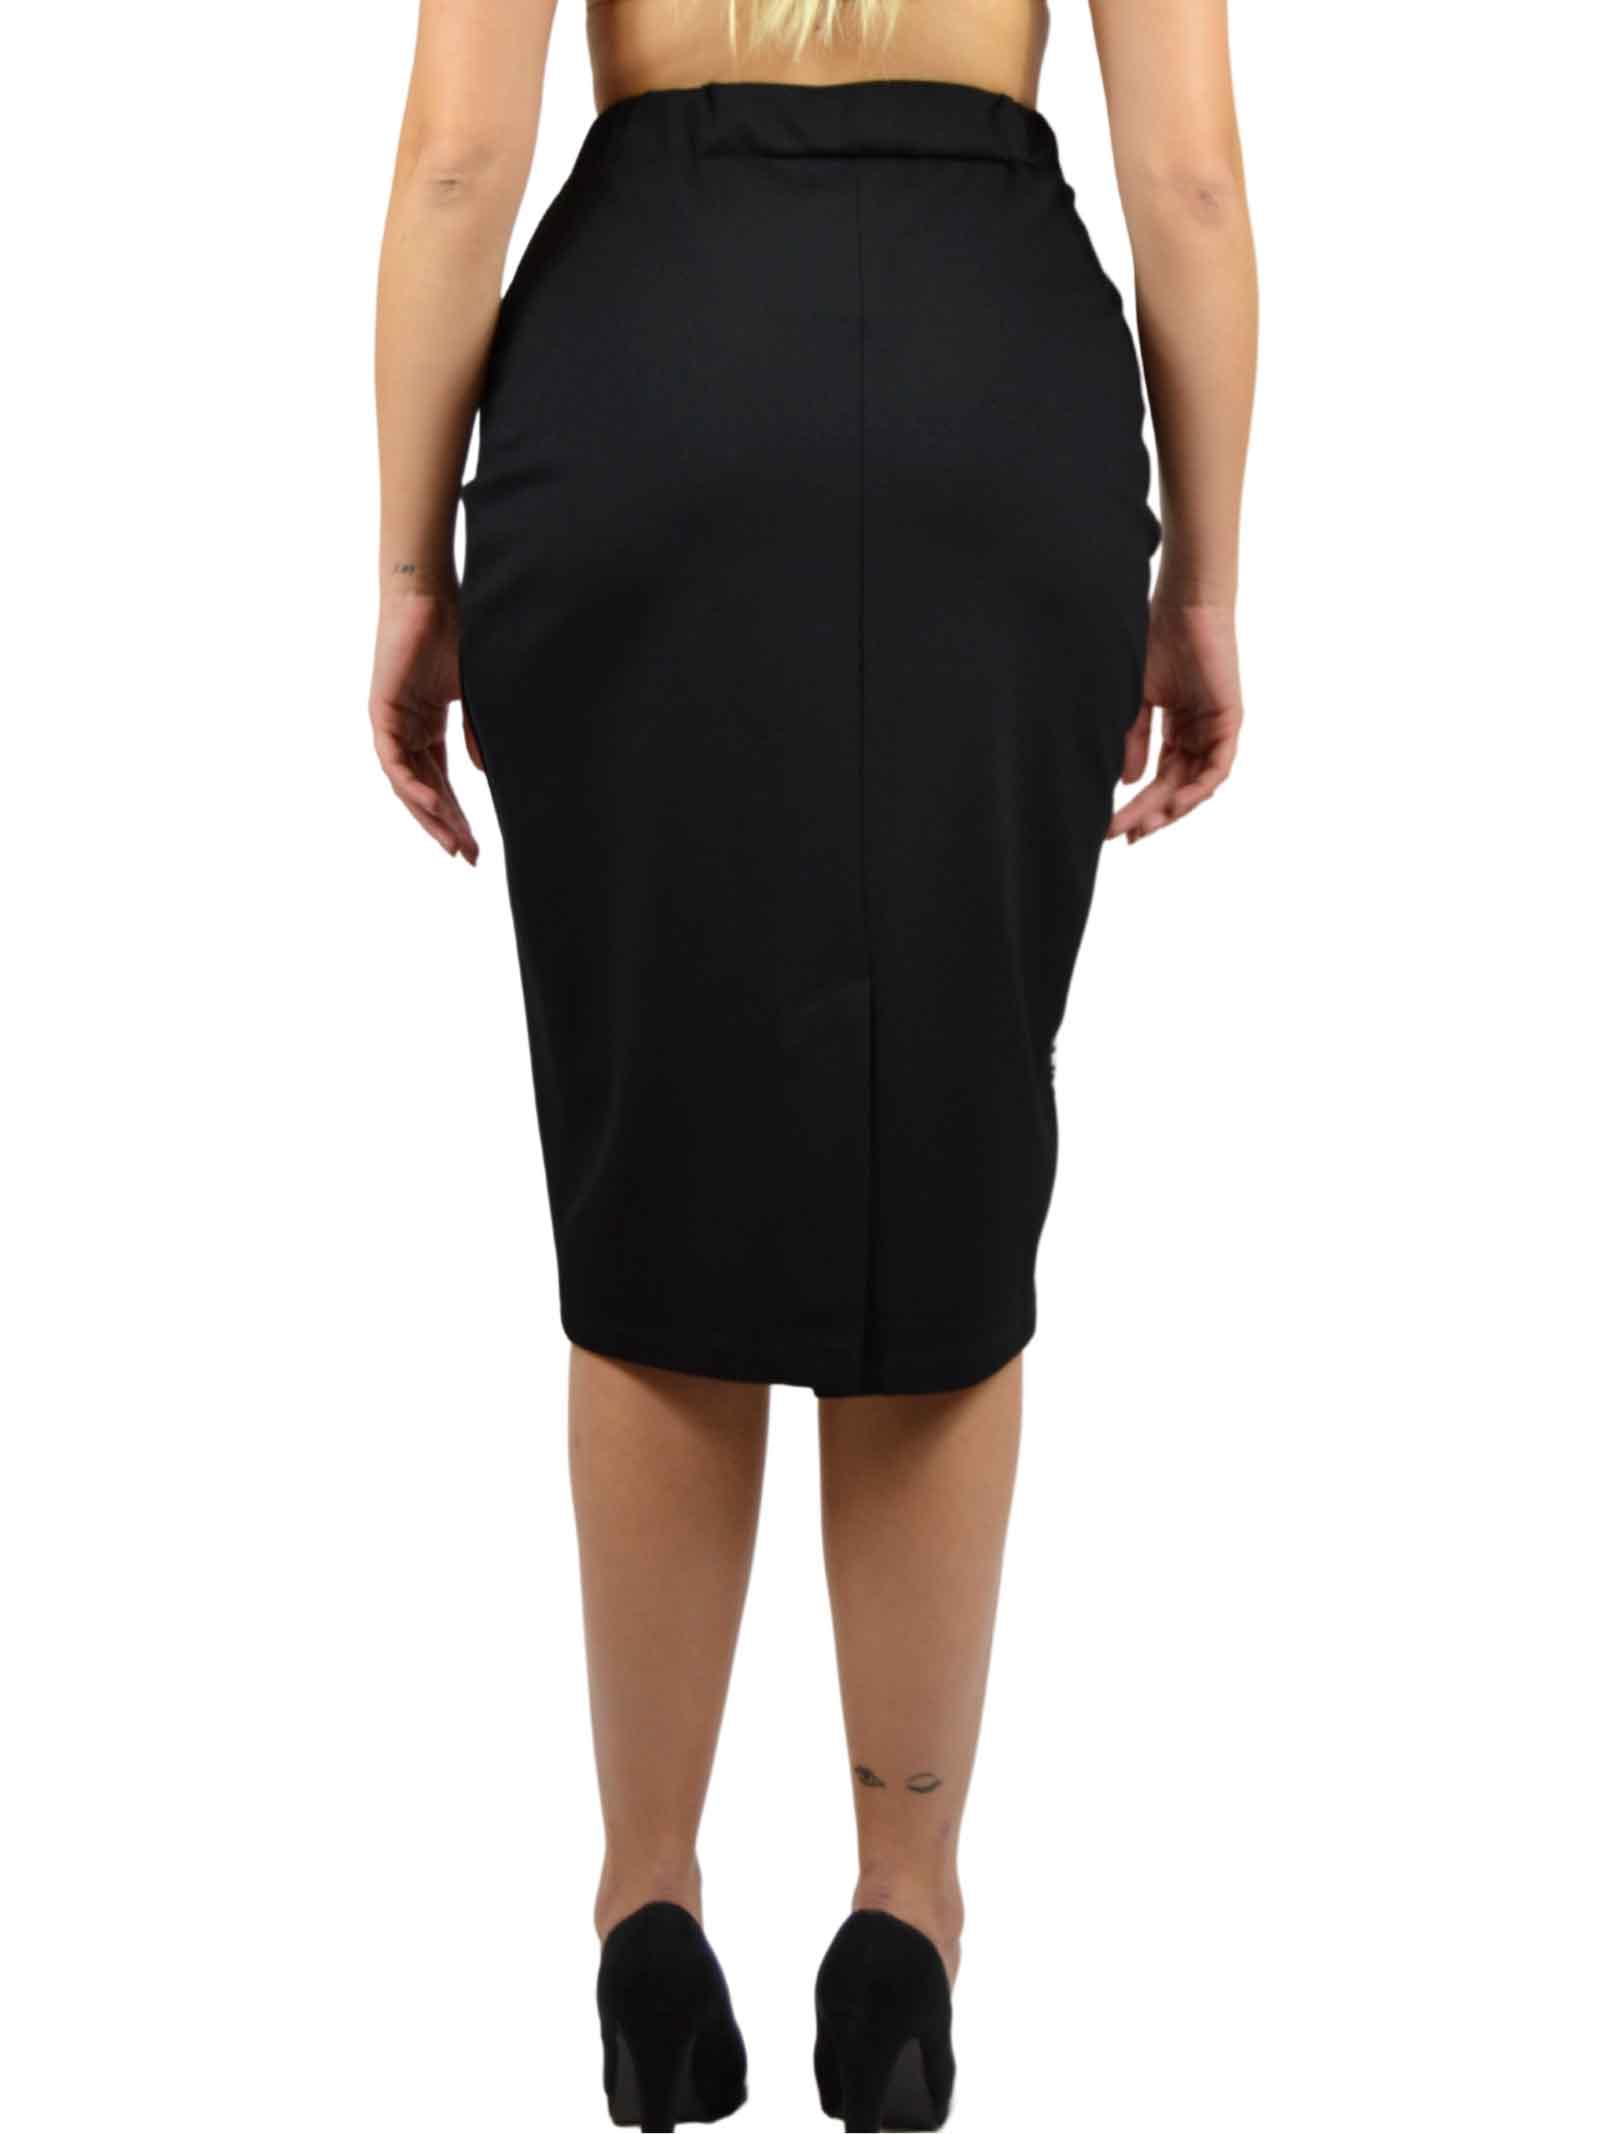 Stretch pencil Skirt with elastic waist  MEALYS |  | CY-G33001